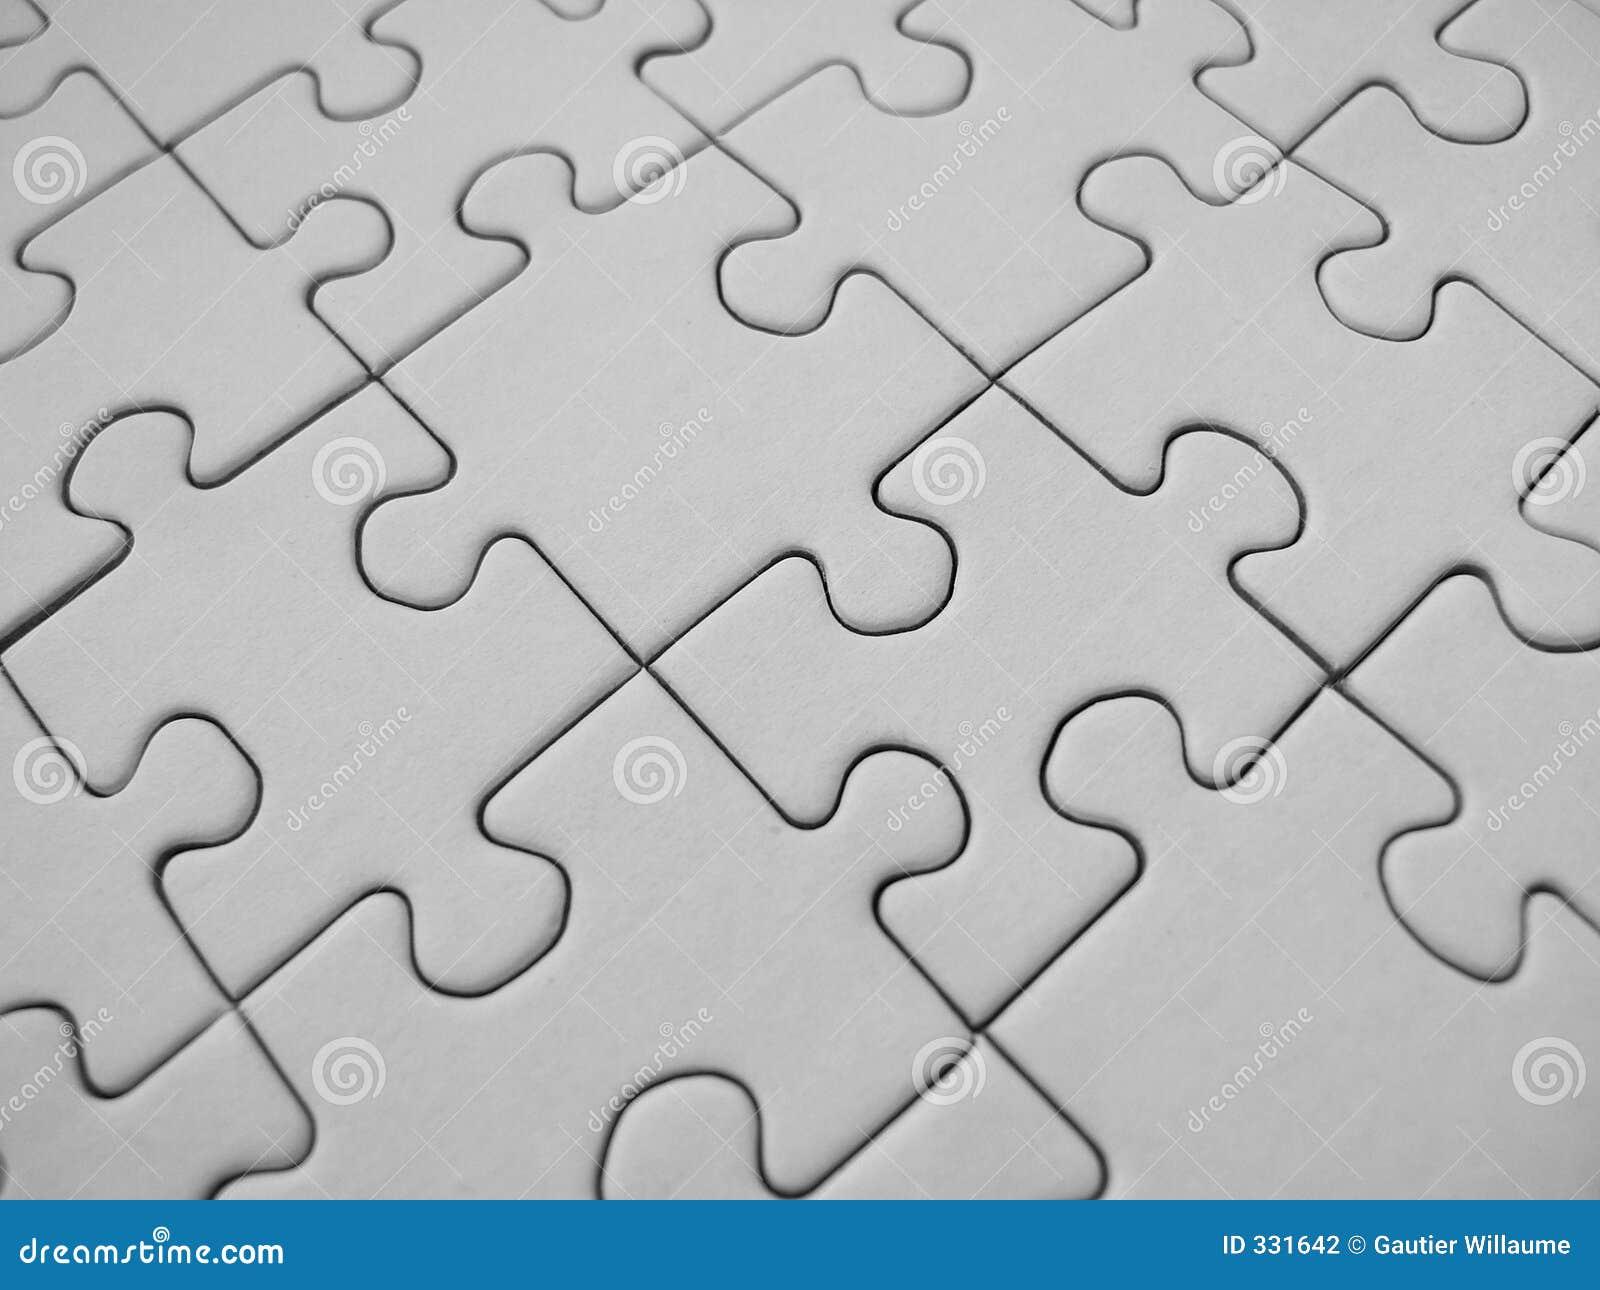 Download Jigsaw pattern stock illustration. Illustration of conceptual - 331642